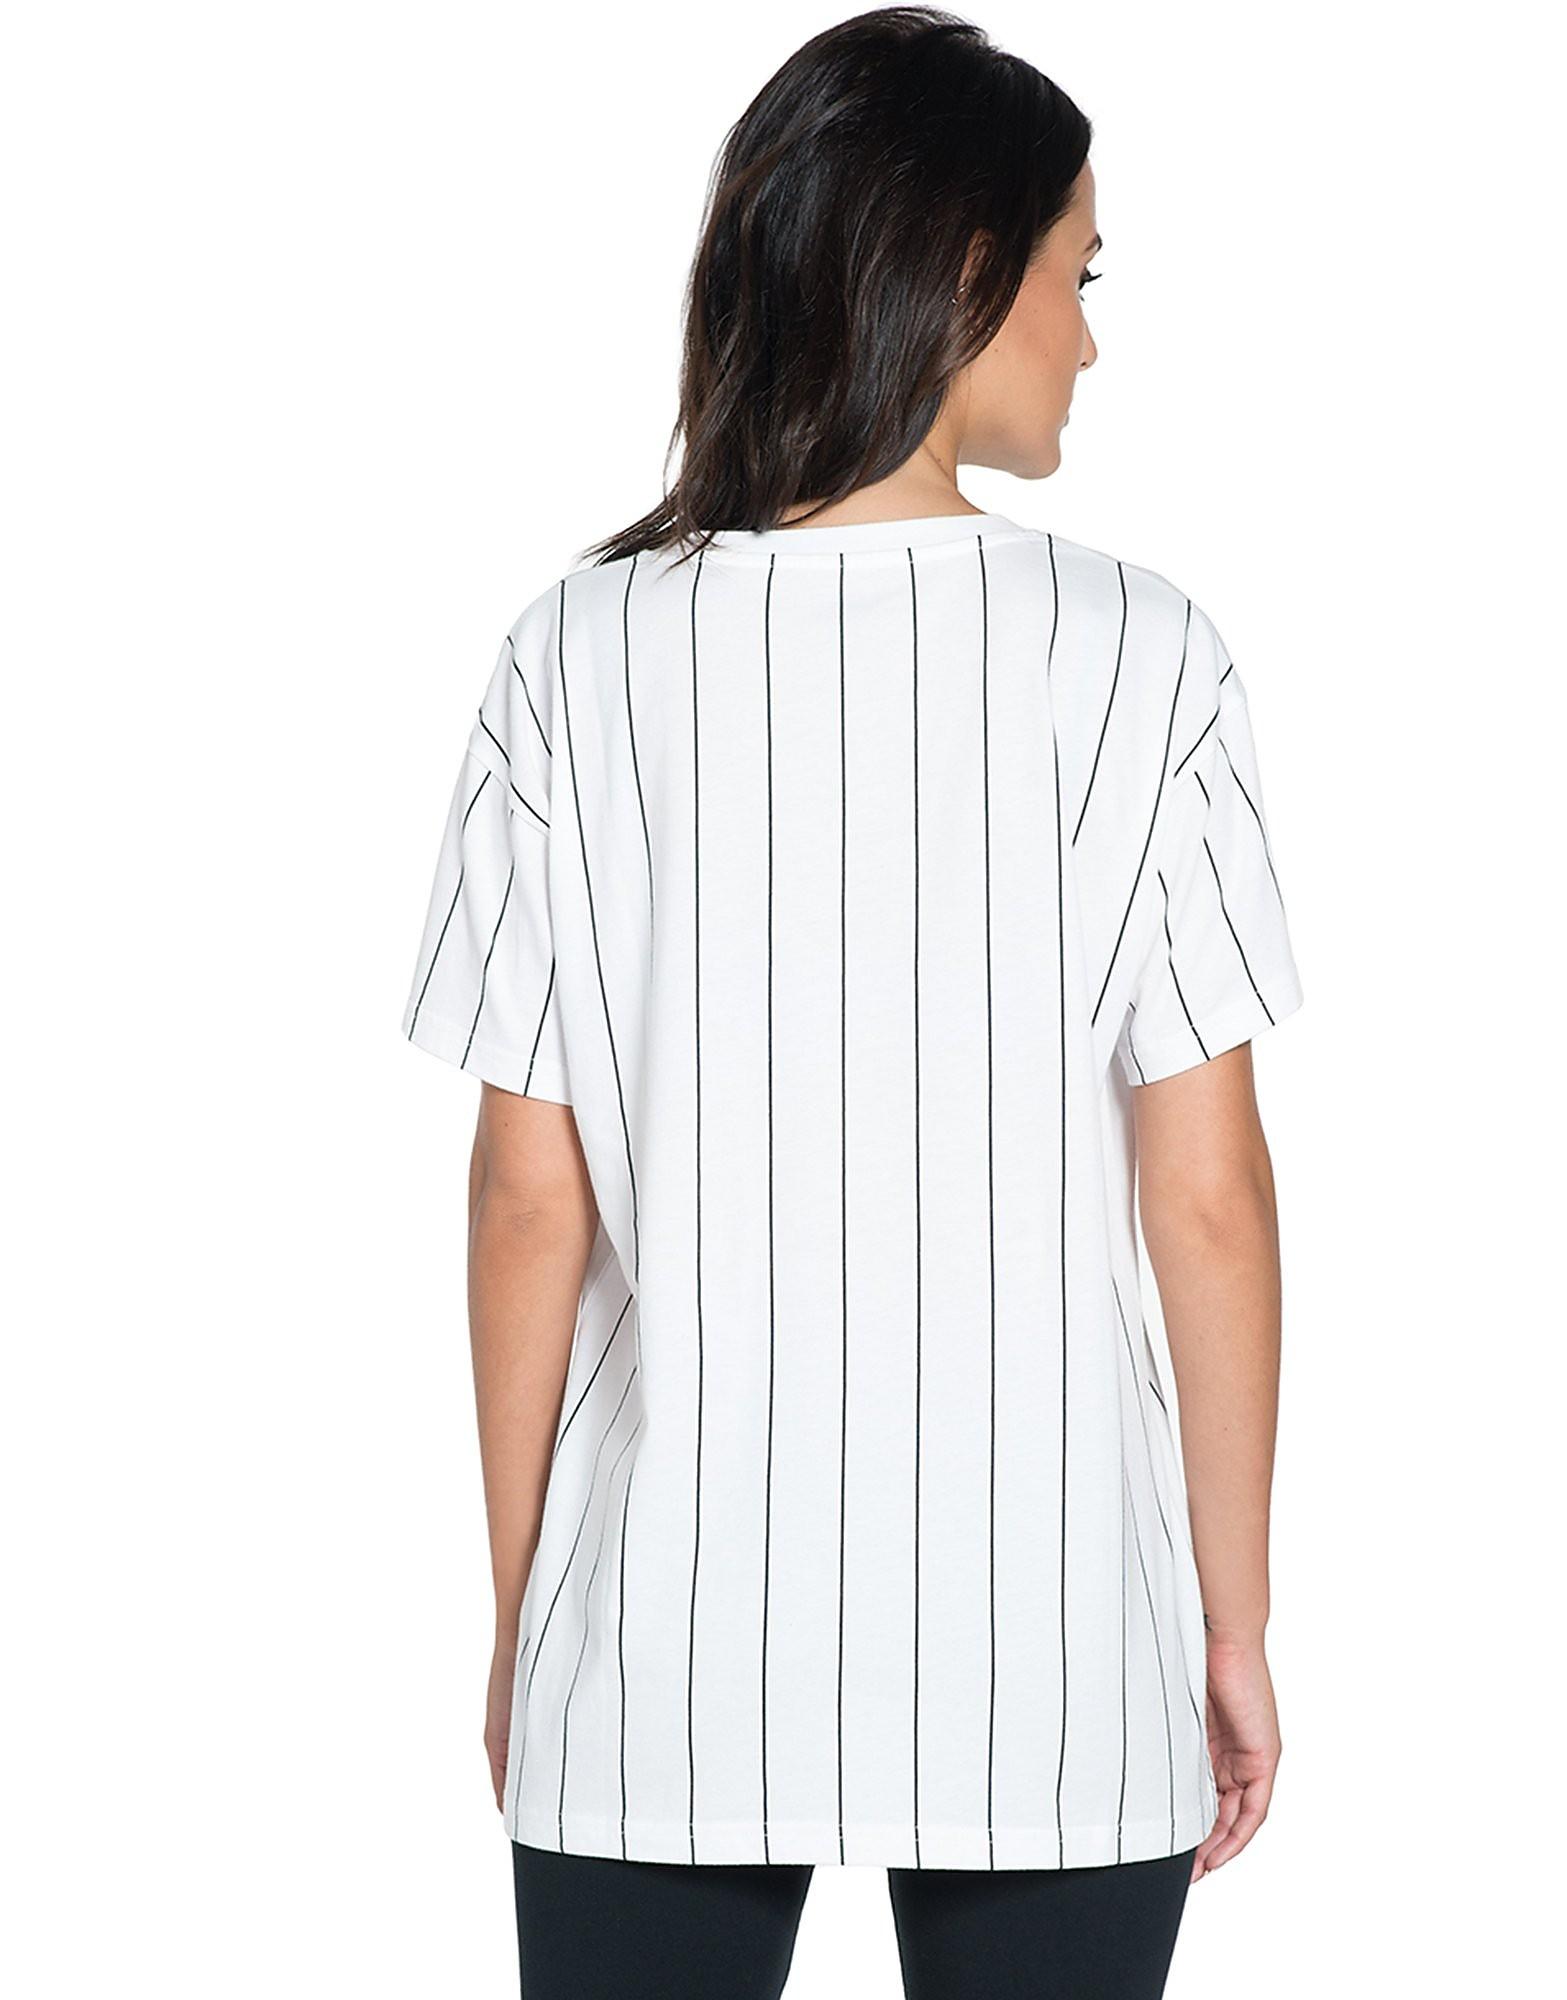 PUMA Gold Pack Stripe T-Shirt